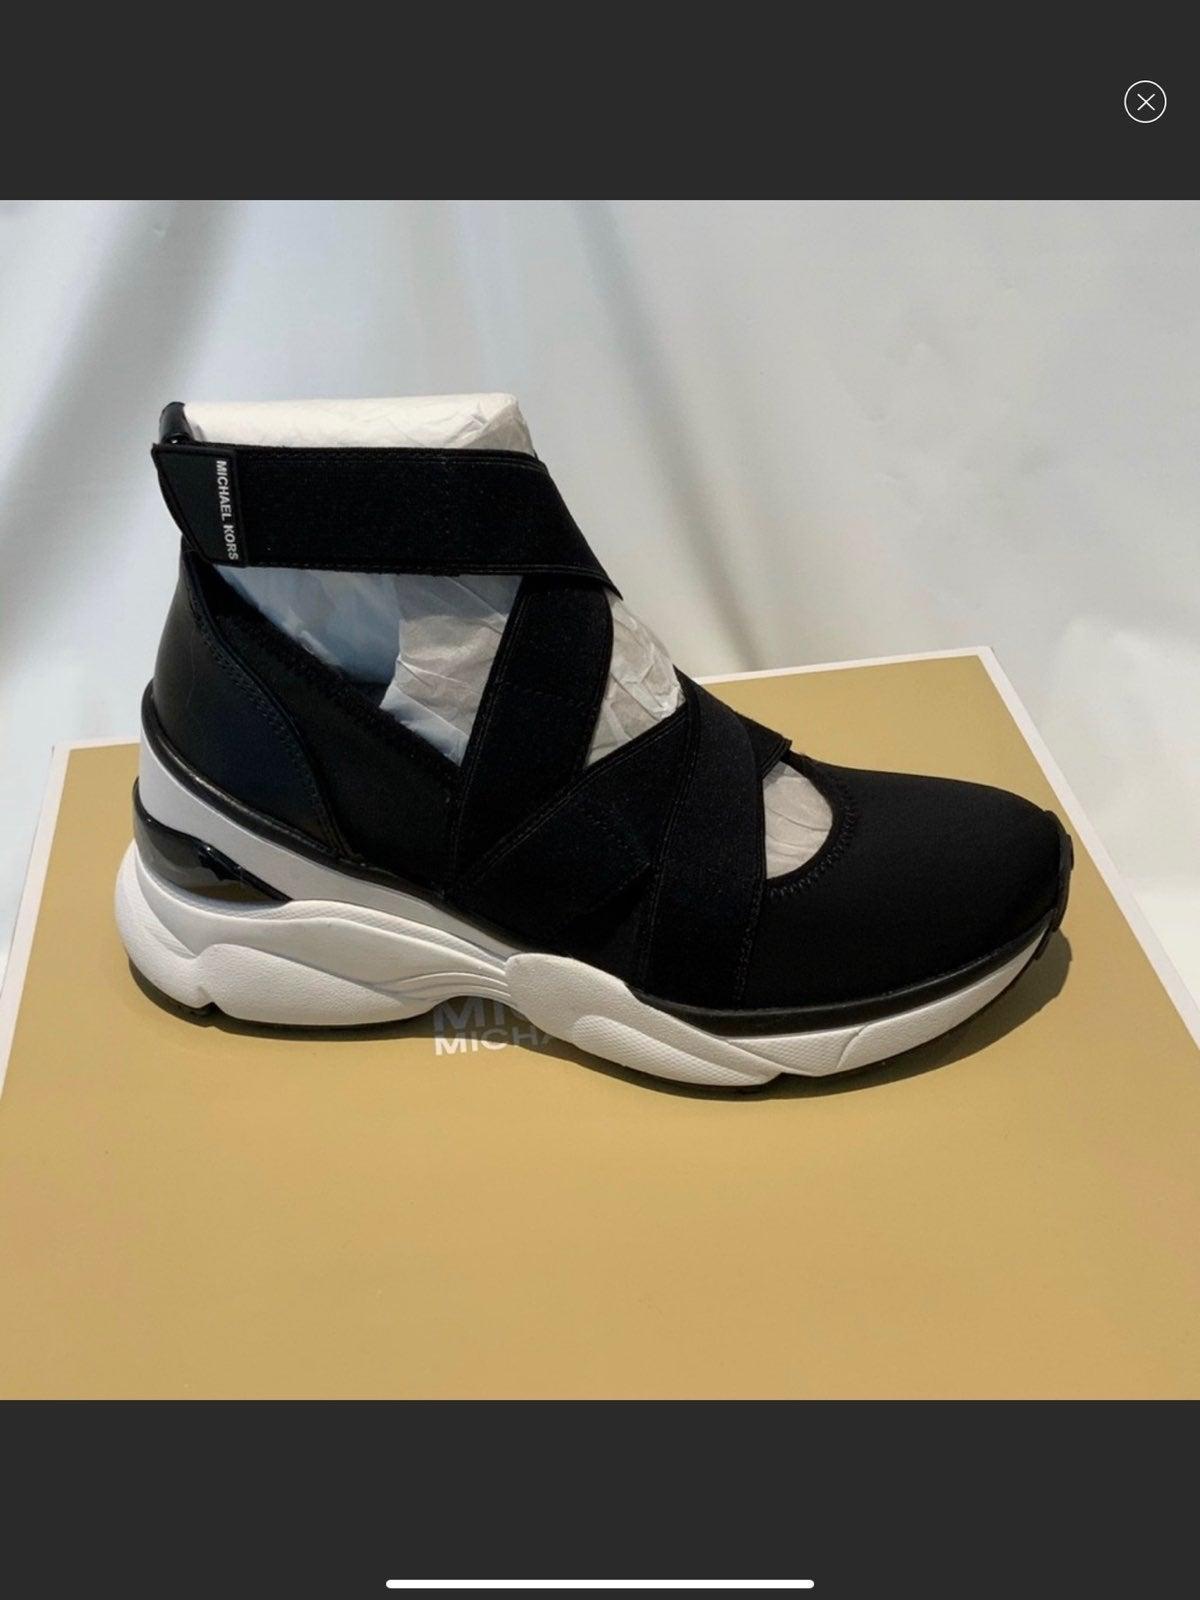 Michael Kors Womens Black Slip On Shoes